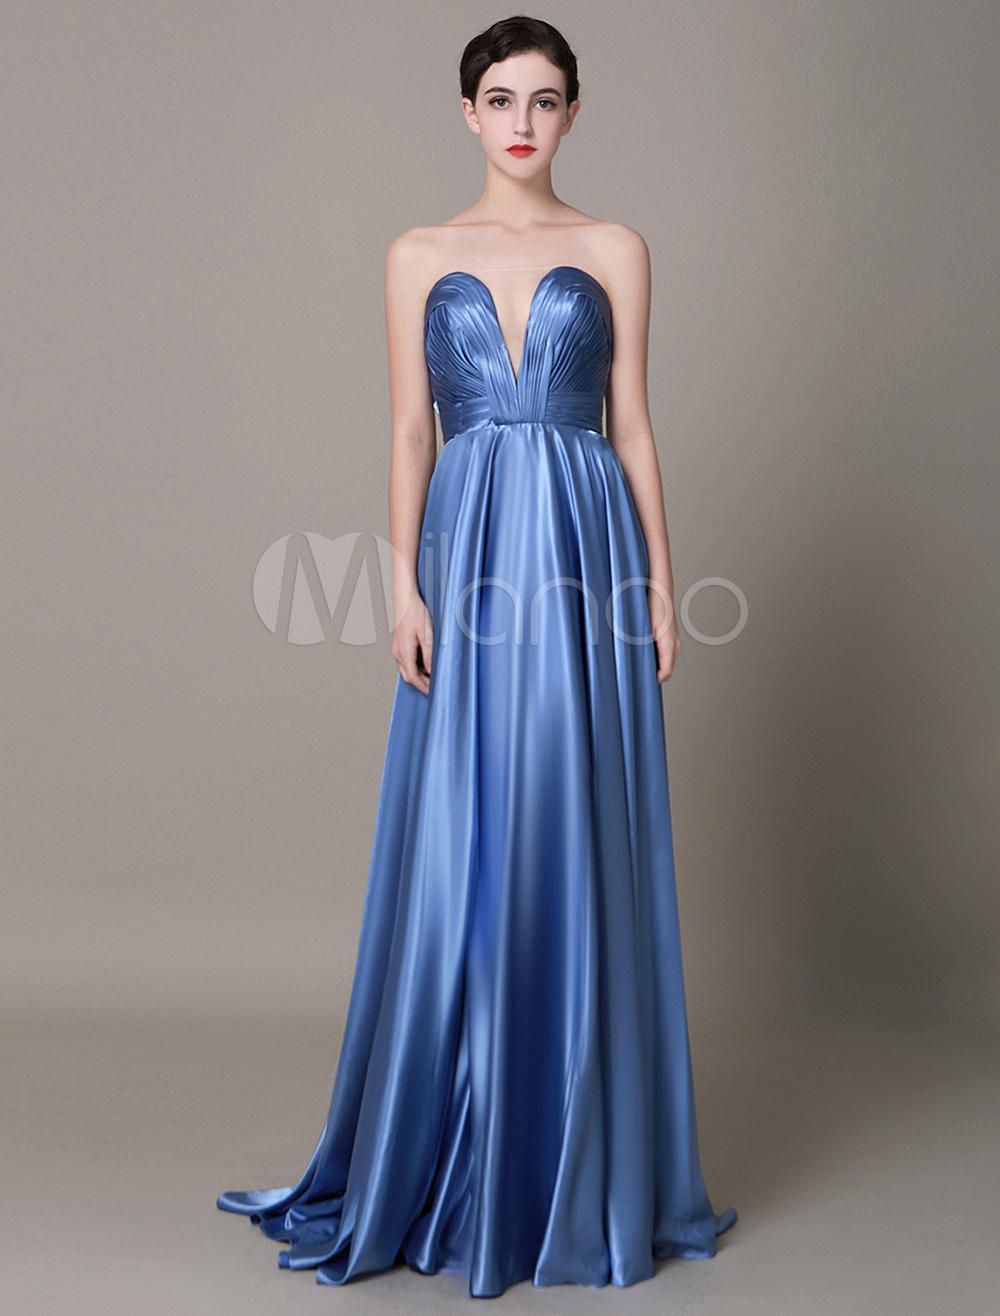 Blue Prom Dress 2018 Long Satin Evening Dress Strapless Plunging Floor Length Party Dress Milanoo (Wedding Evening Dresses) photo